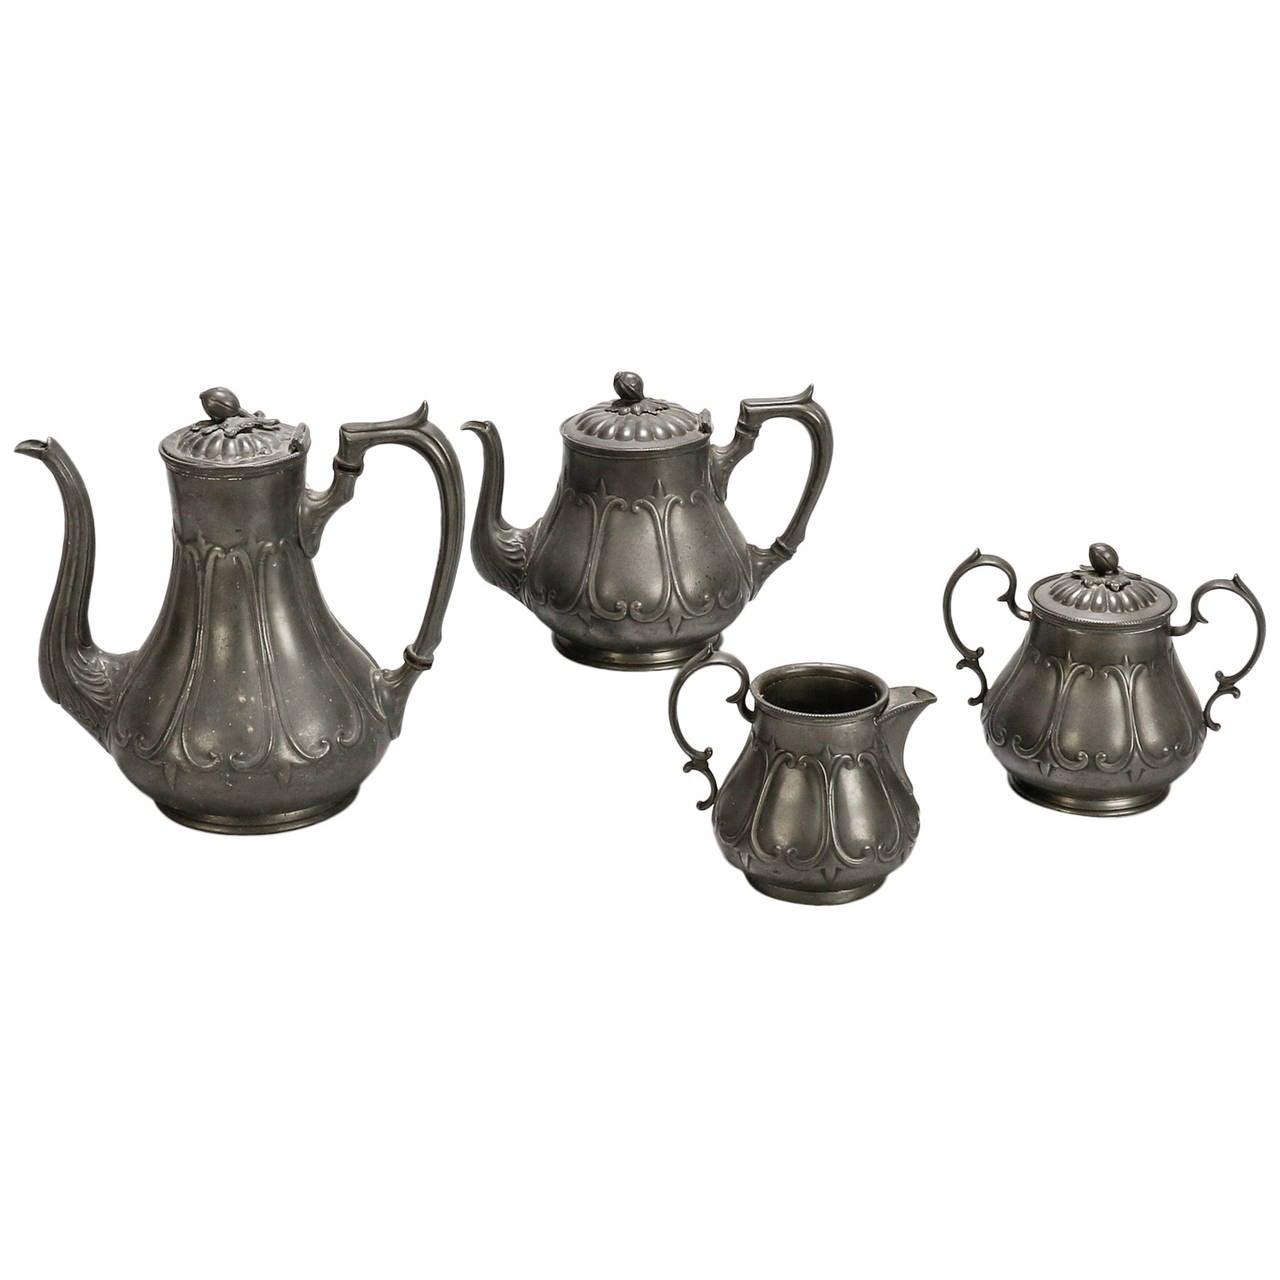 English Pewter Four-Piece Coffee Tea Service 1